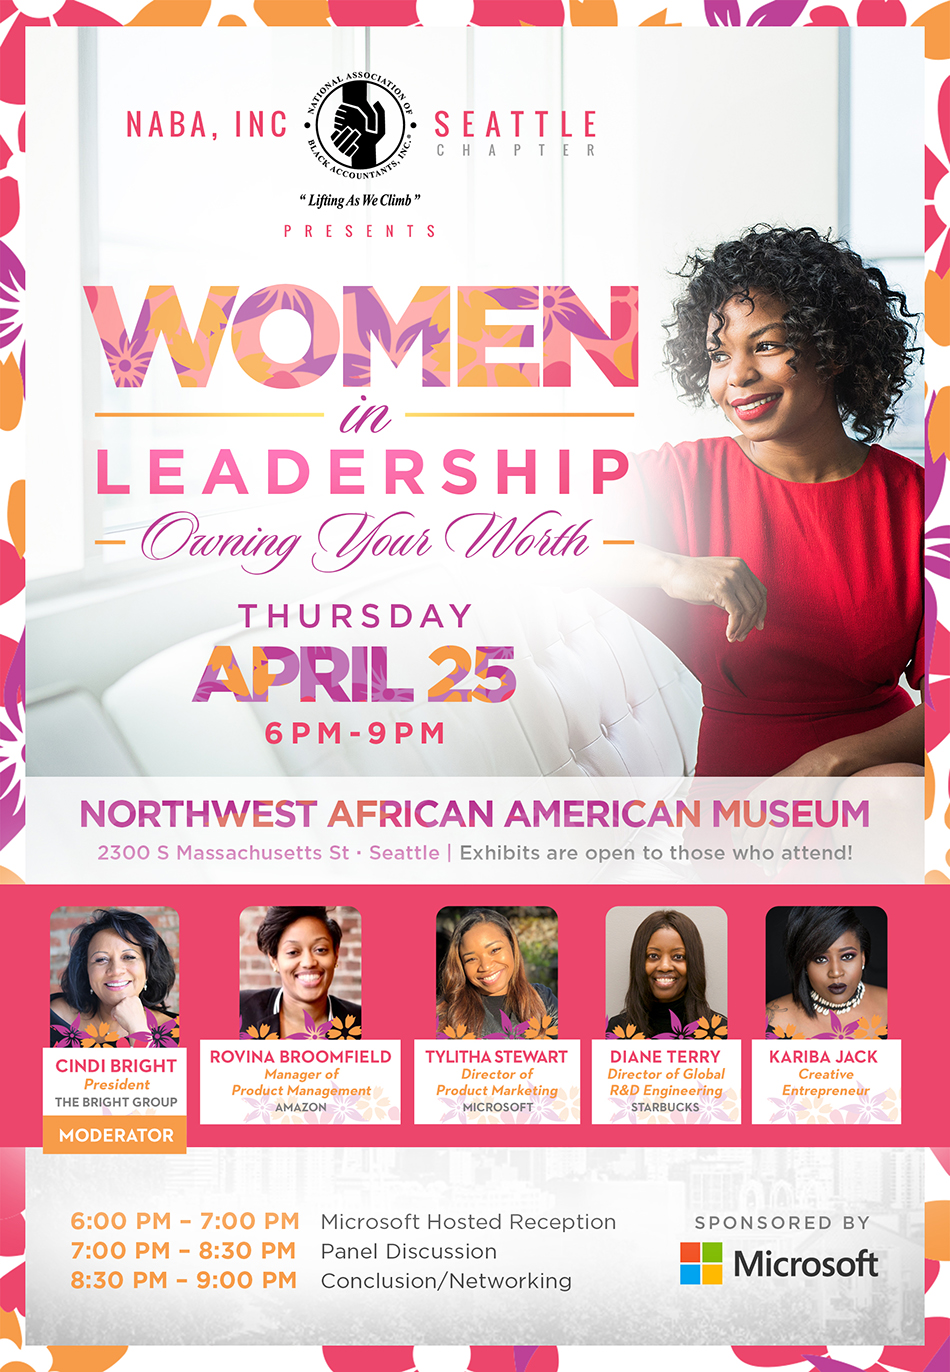 women-in-leadership-with-names-V1-2019.jpg